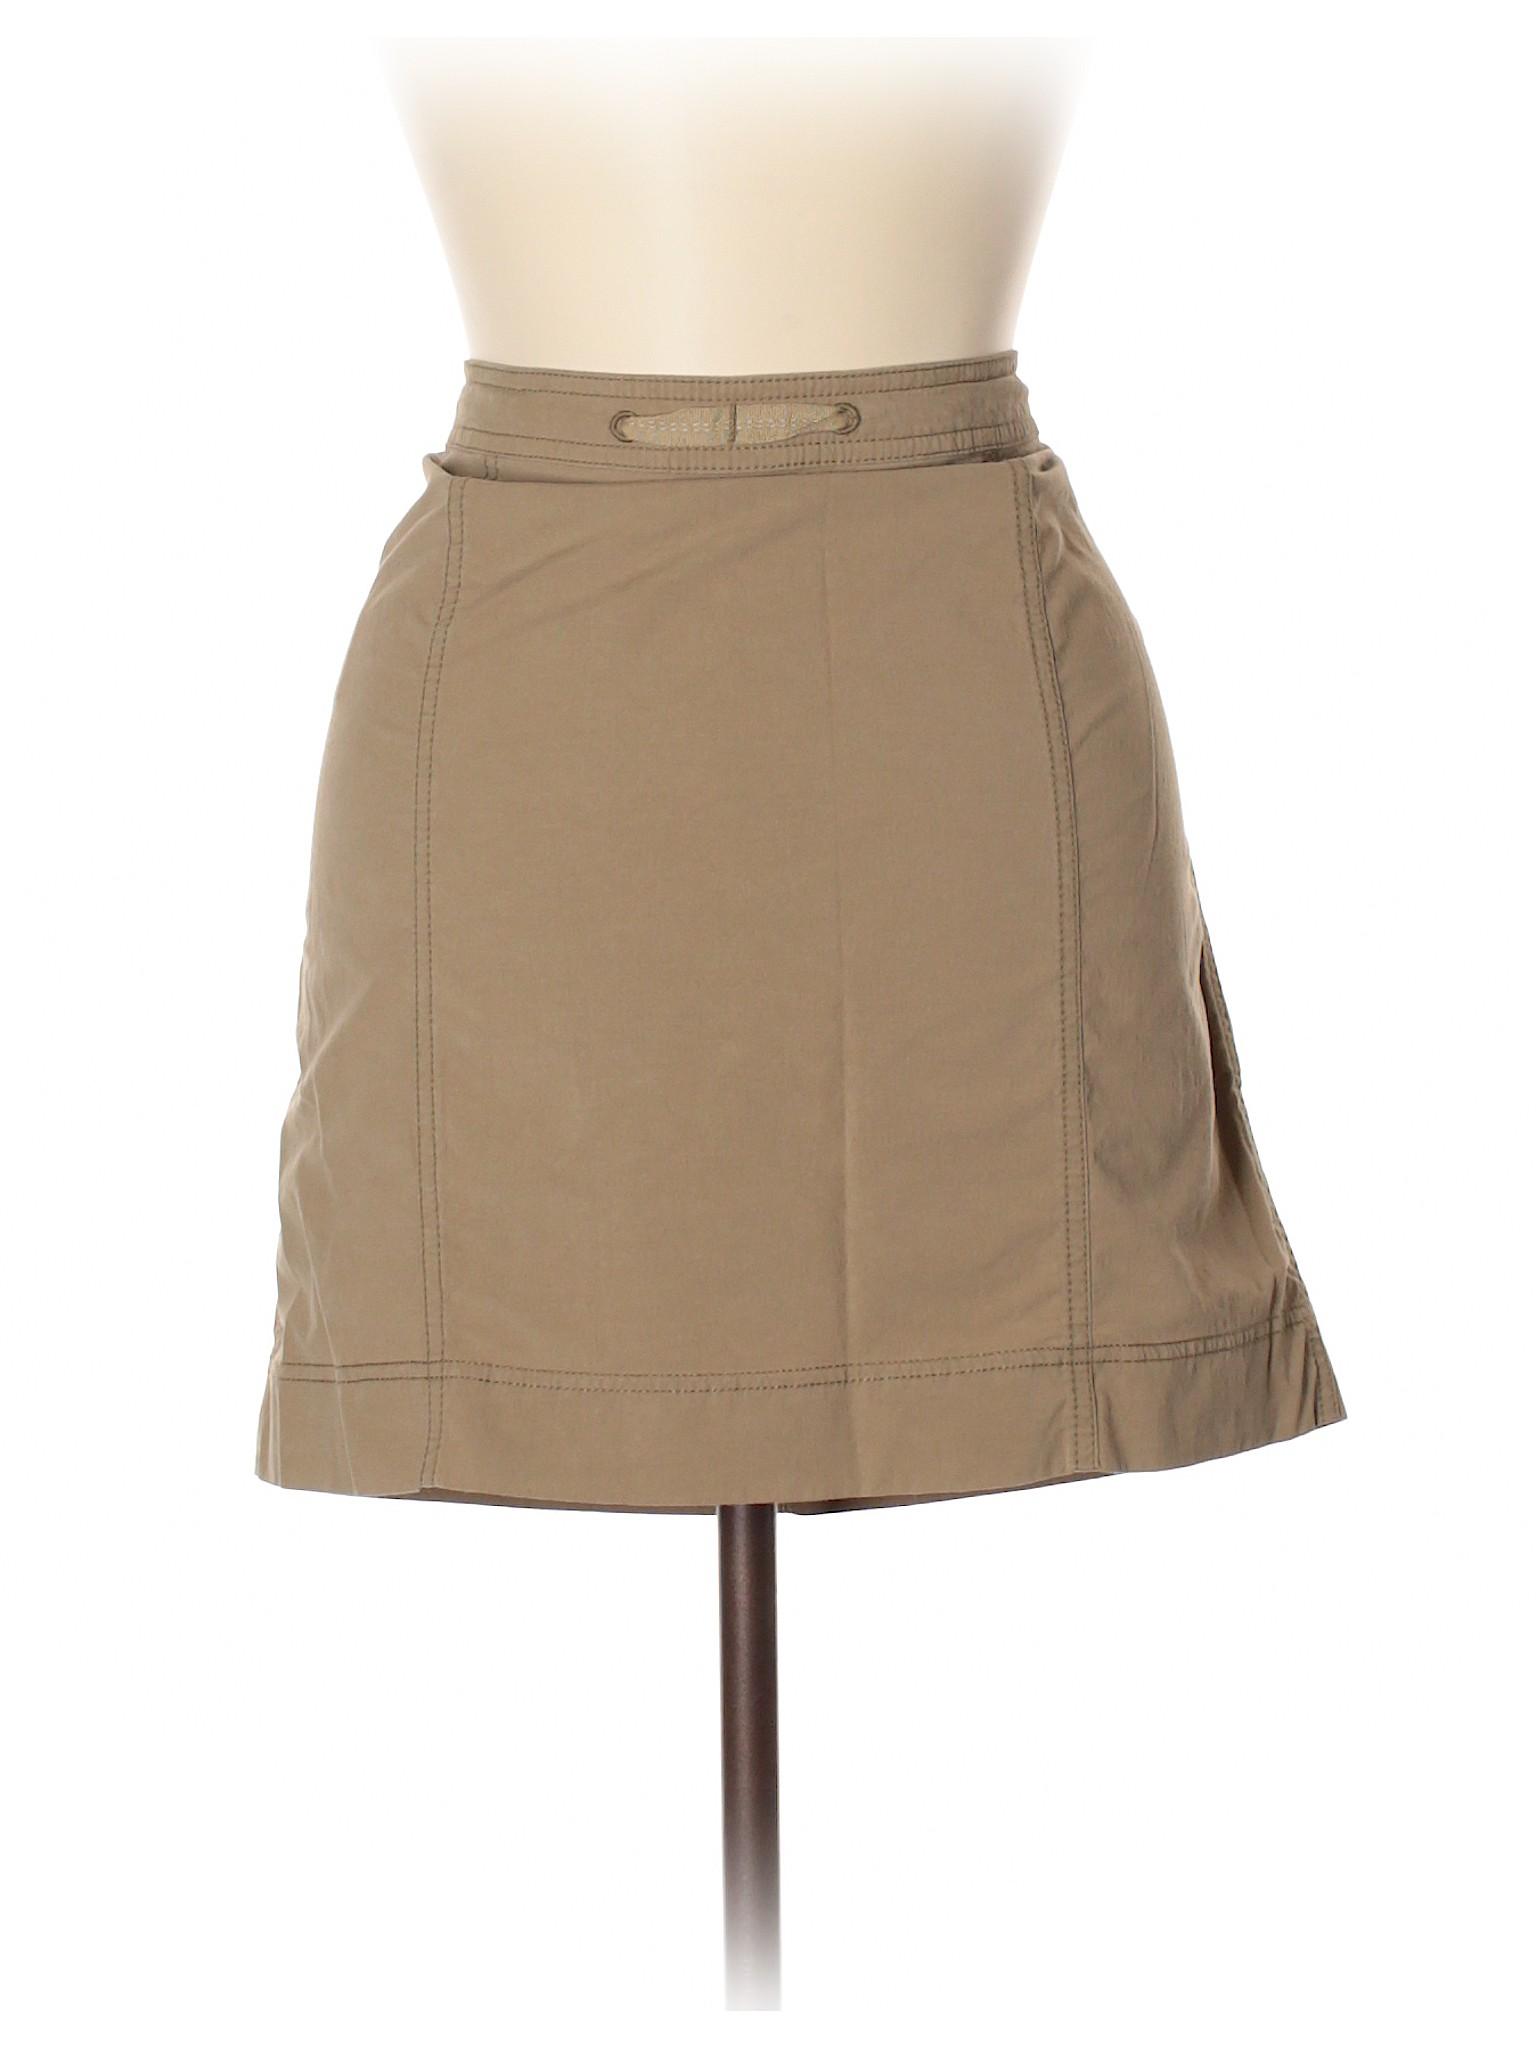 Boutique leisure Casual leisure Casual leisure Skirt Boutique Boutique Skirt Marmot Casual leisure Marmot Marmot Boutique Skirt fwwqICd